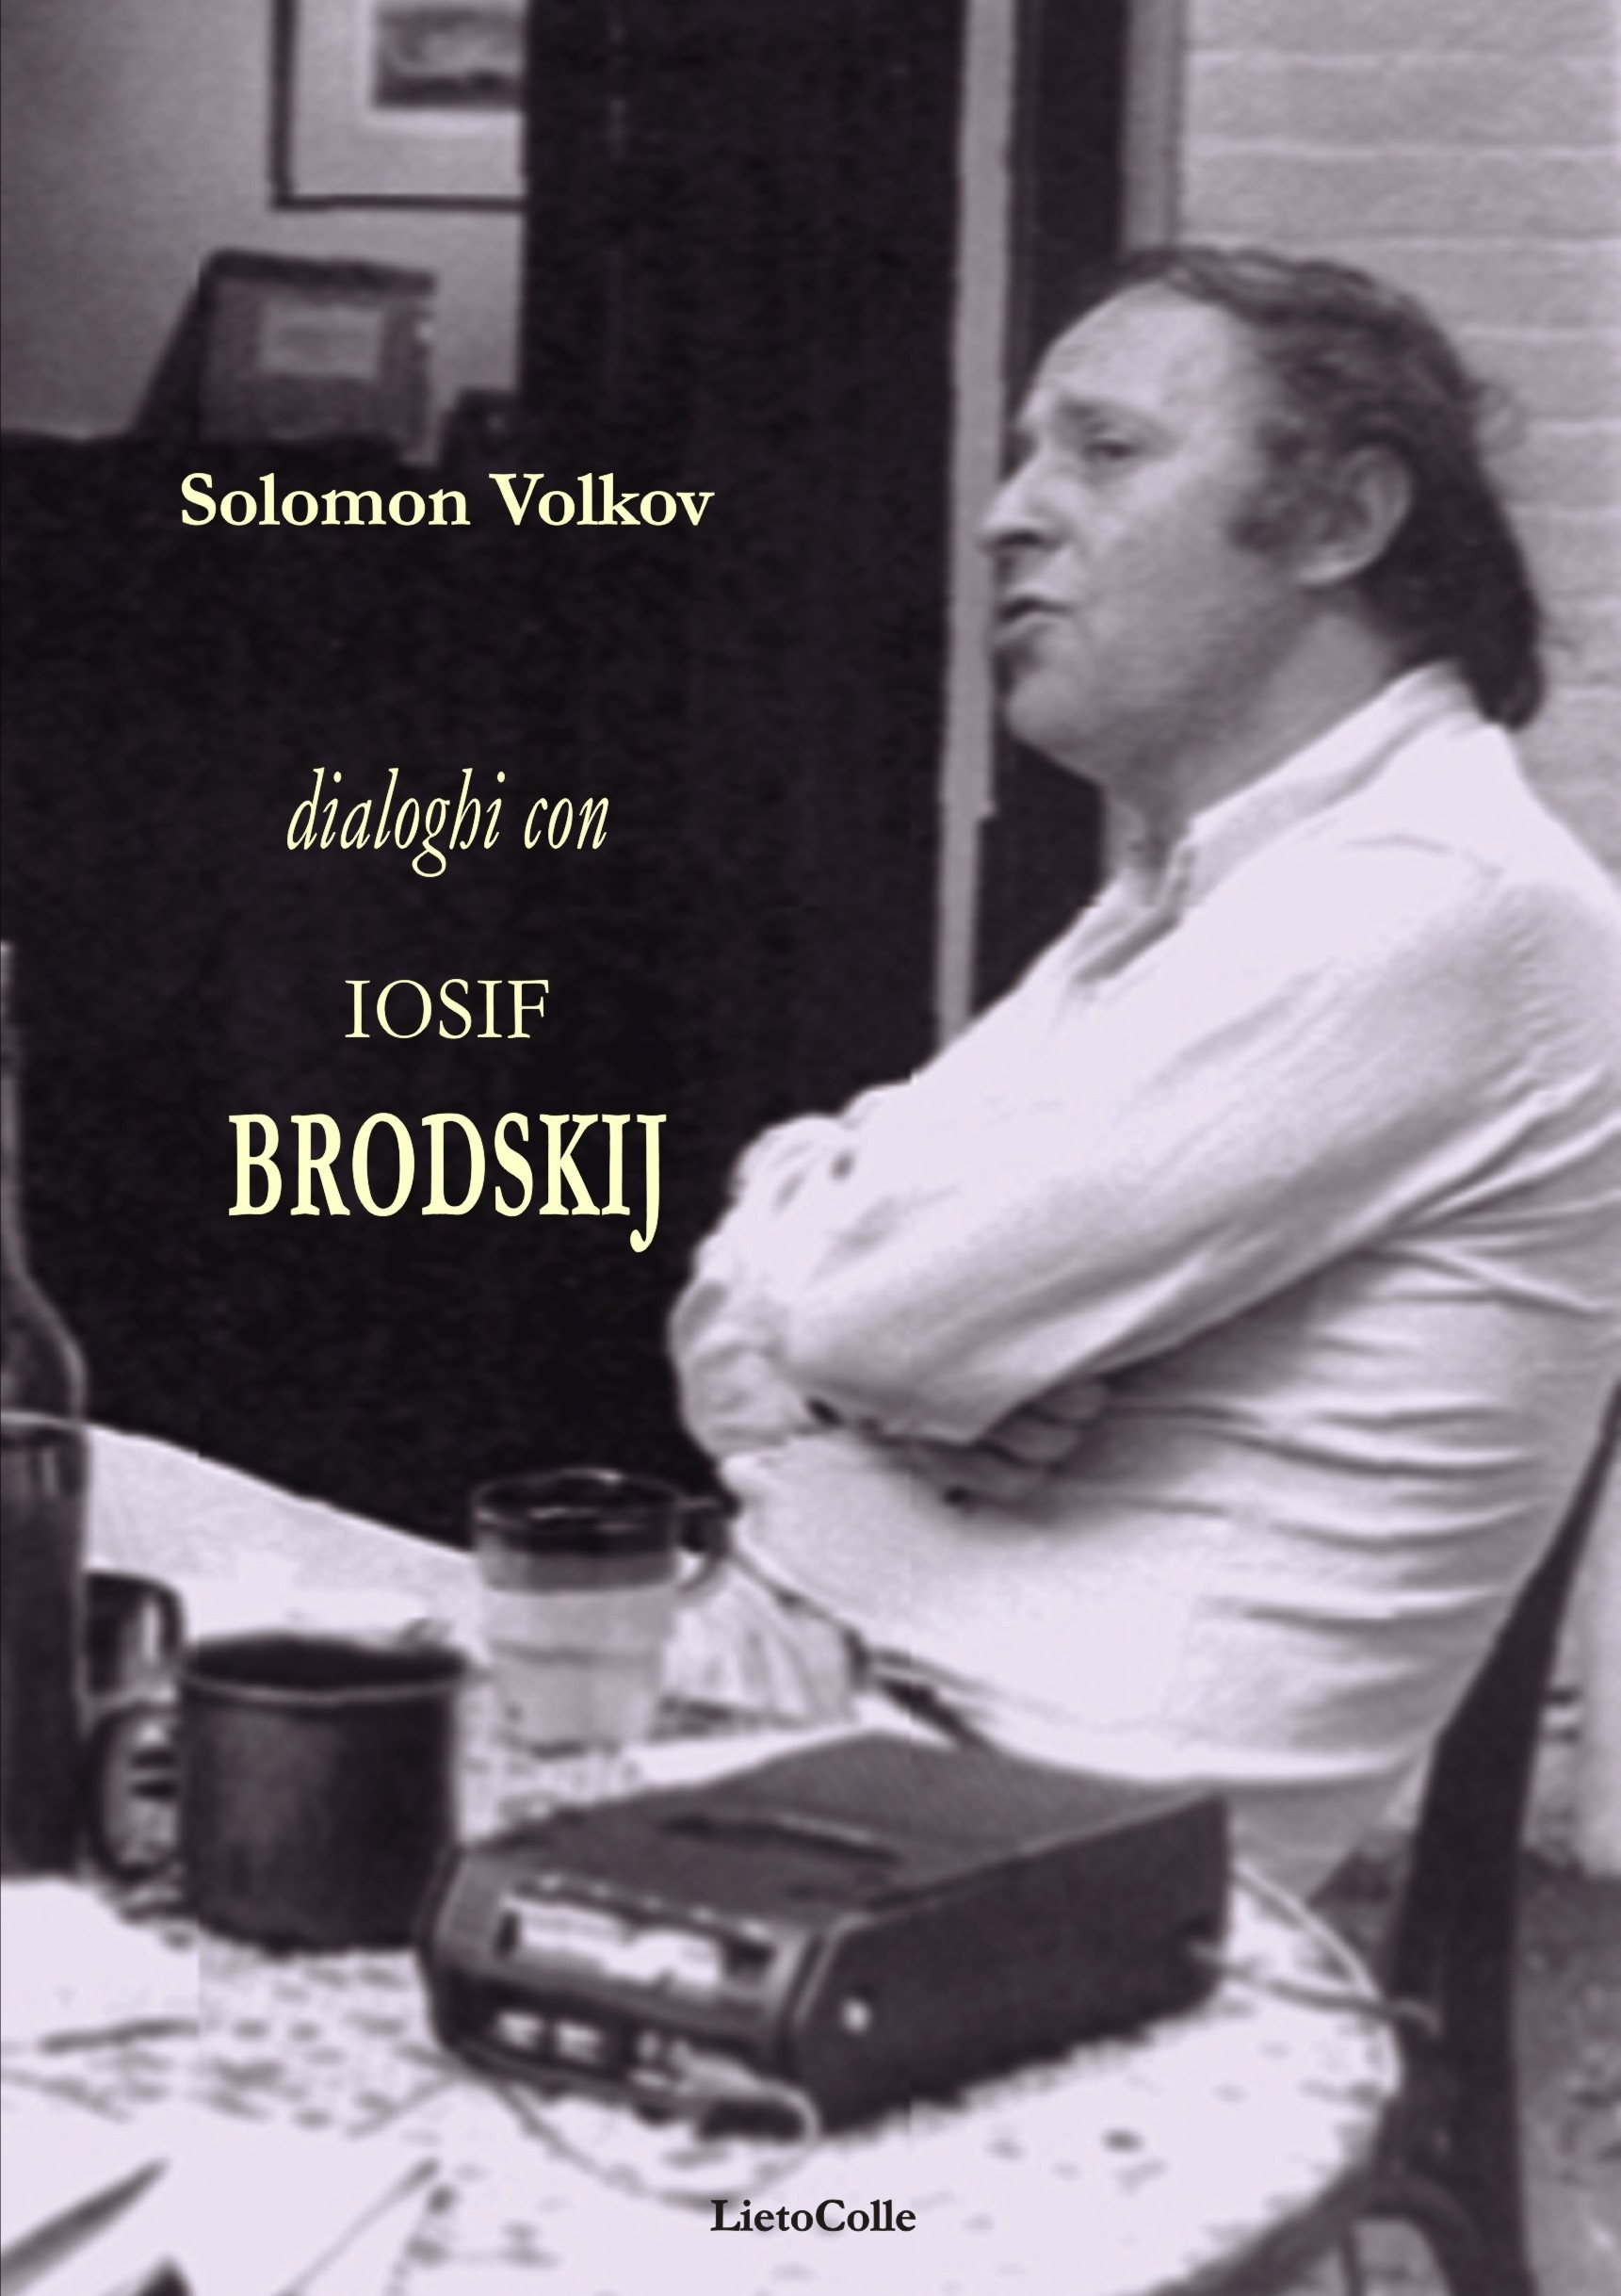 Solomon-Volkov-Dialoghi-con-Brodskij-copertinaPIATTA